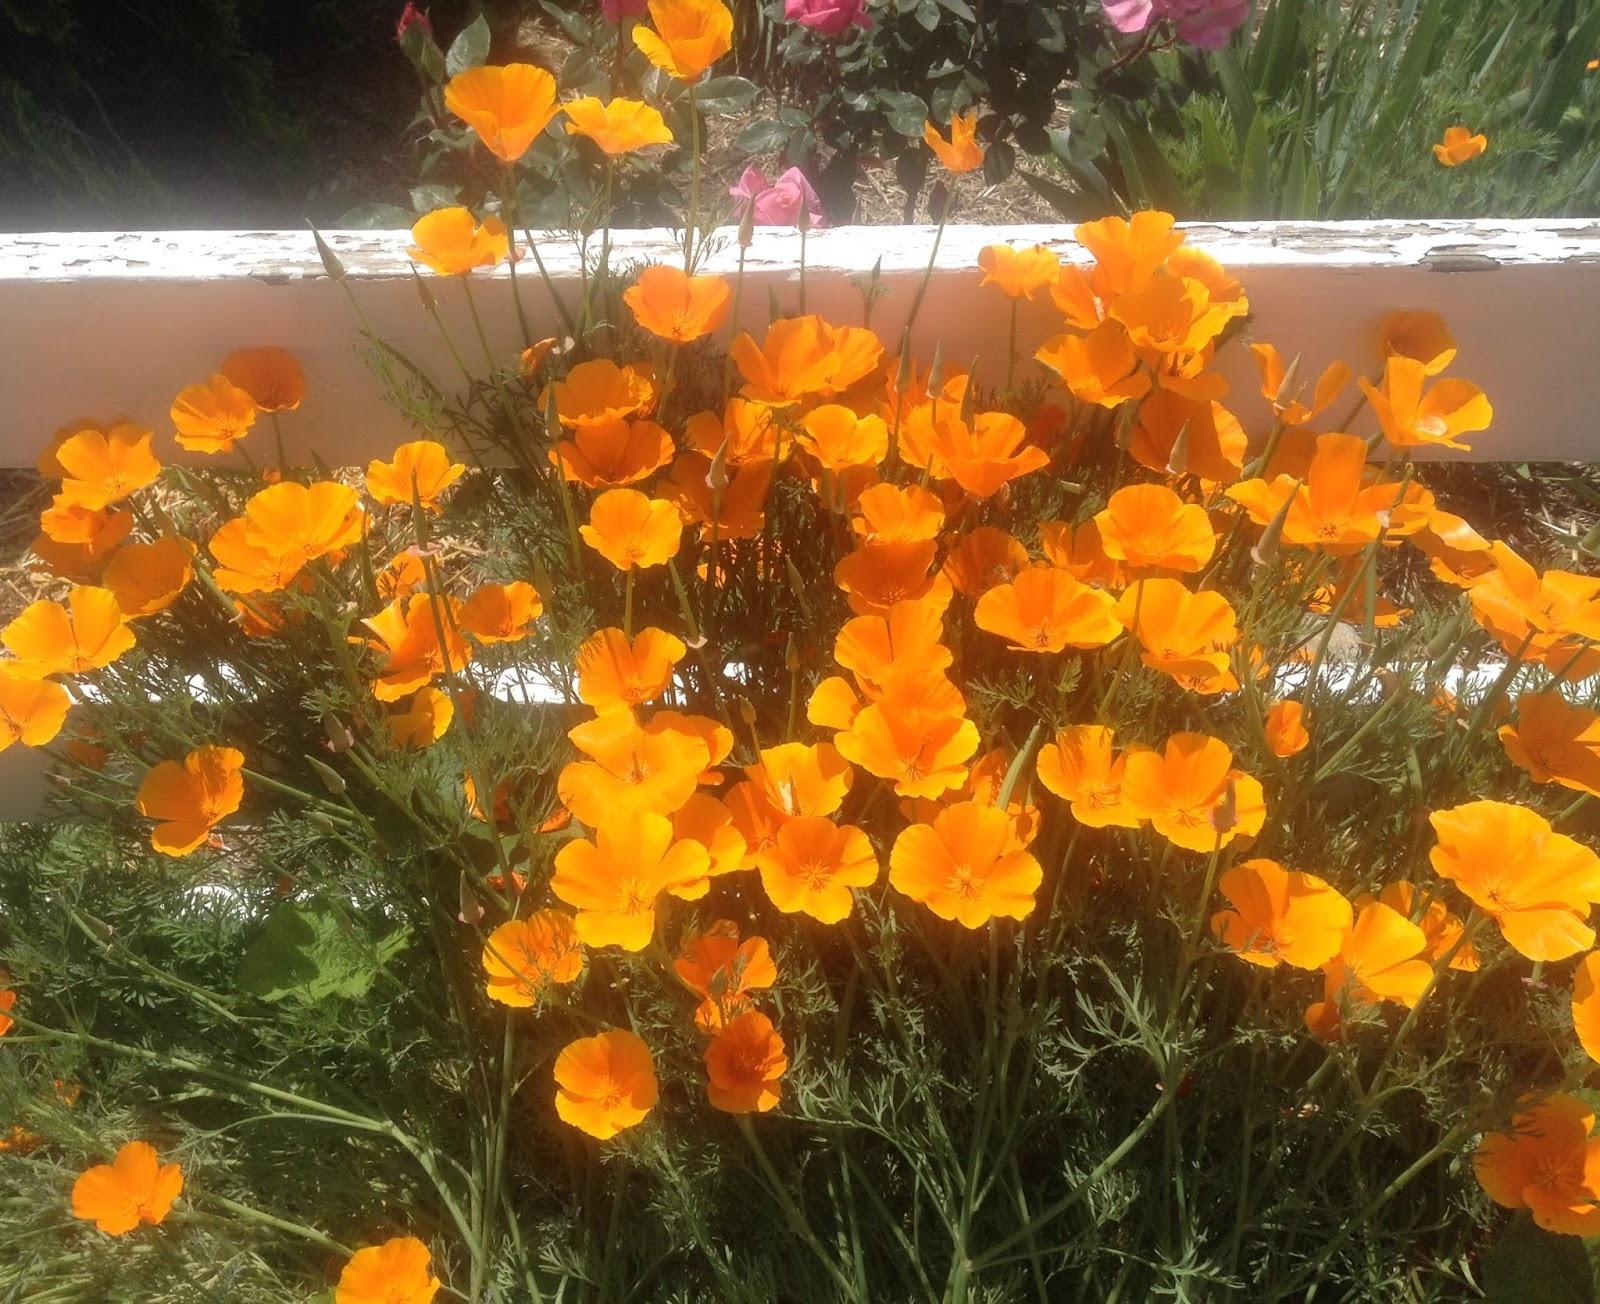 Theawakenedsoul California Poppies Celery Pink Roses And More